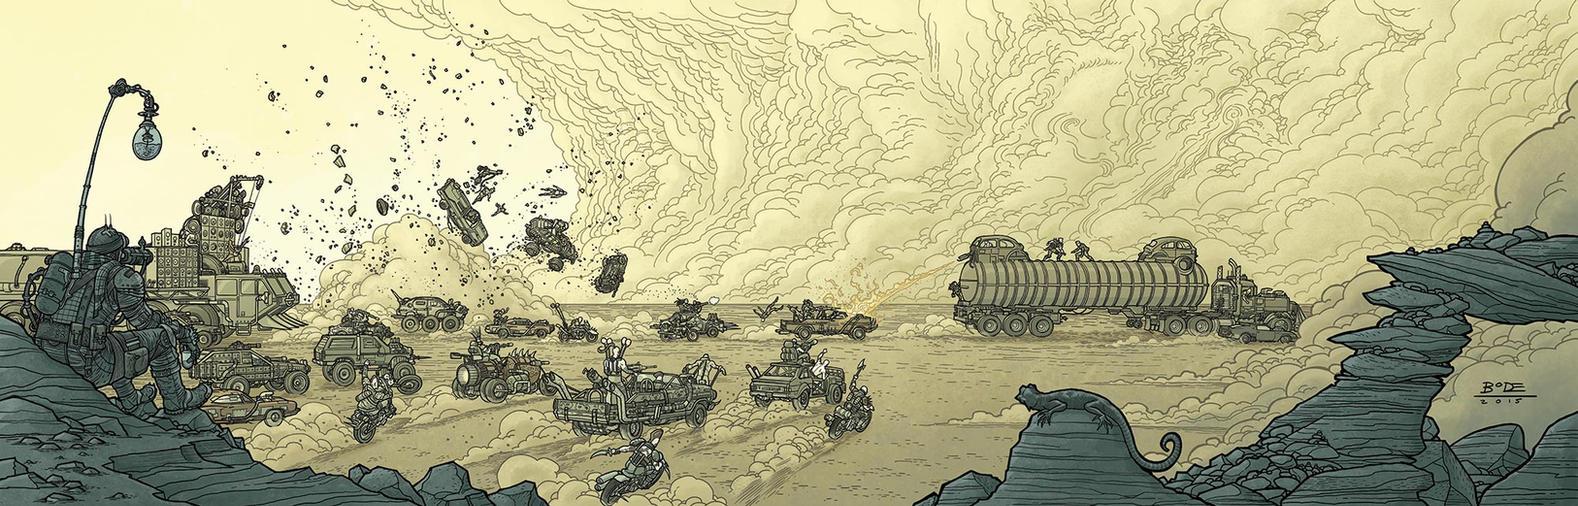 FuryRoad Print by RyanBodenheim